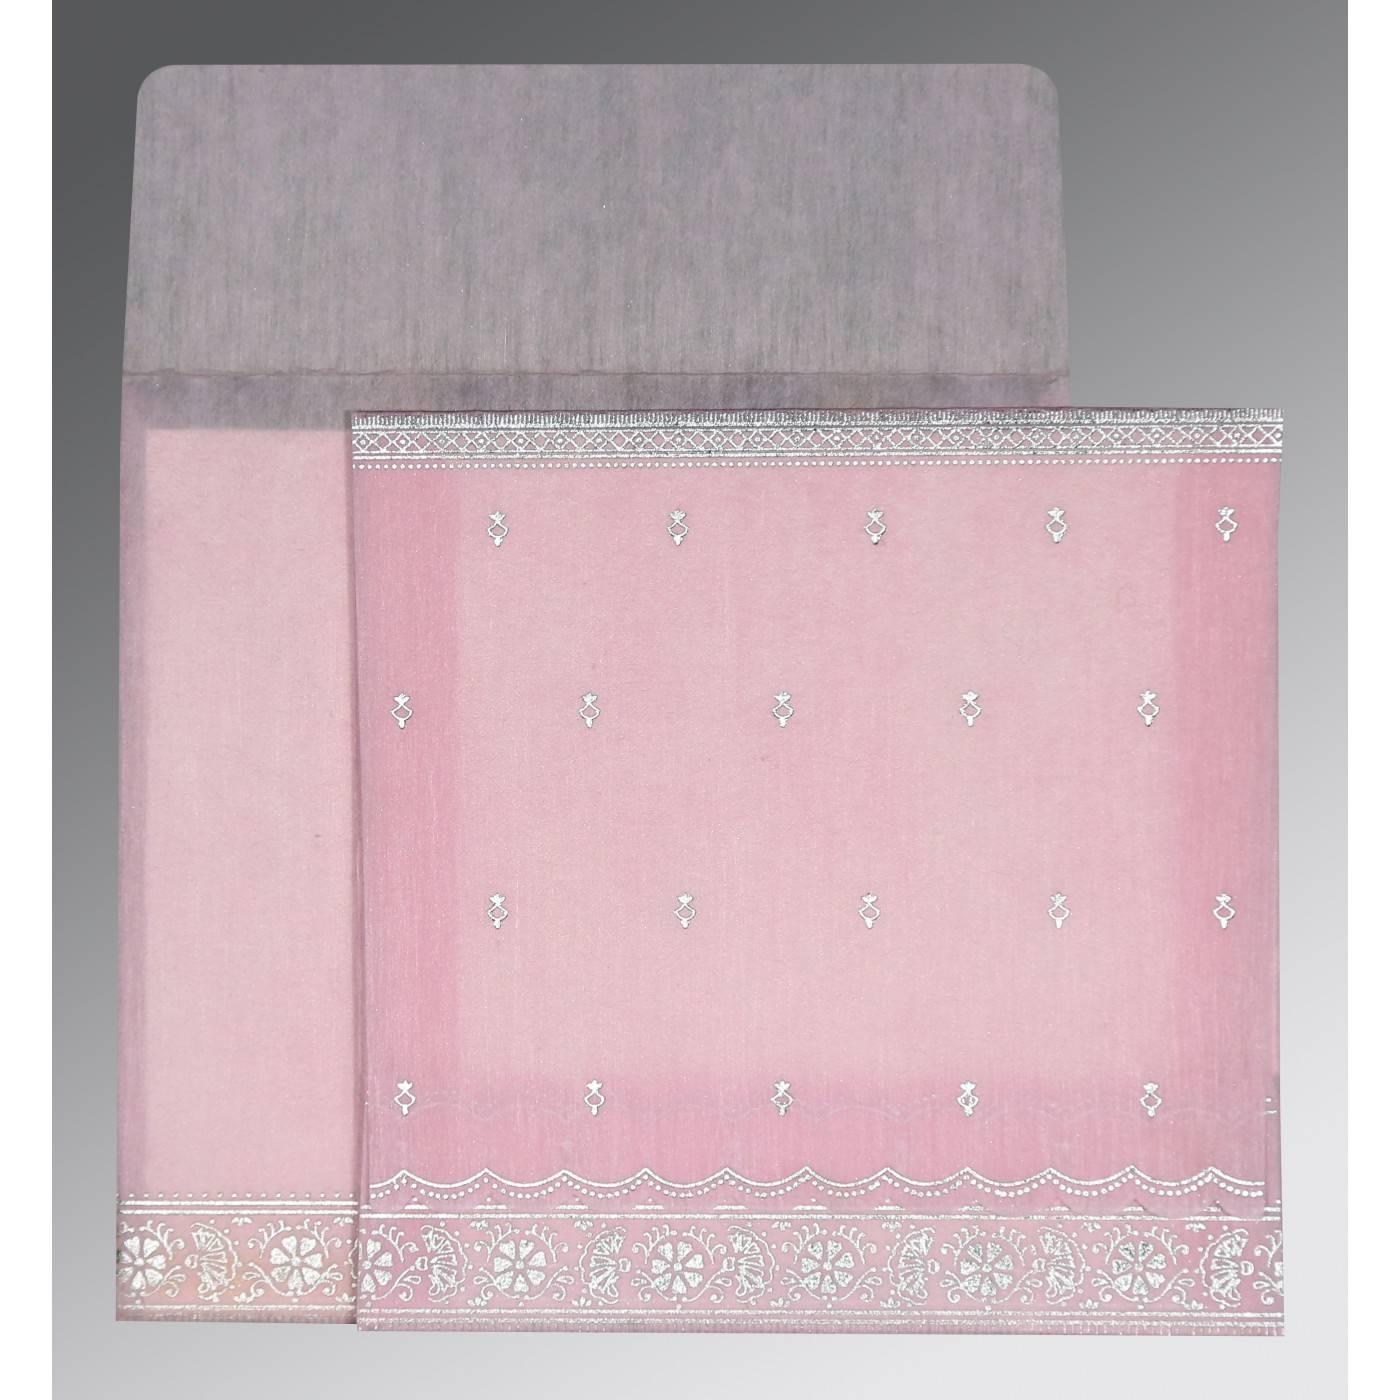 BABY PINK WOOLY FOIL STAMPED WEDDING CARD : CIN-8242N - IndianWeddingCards